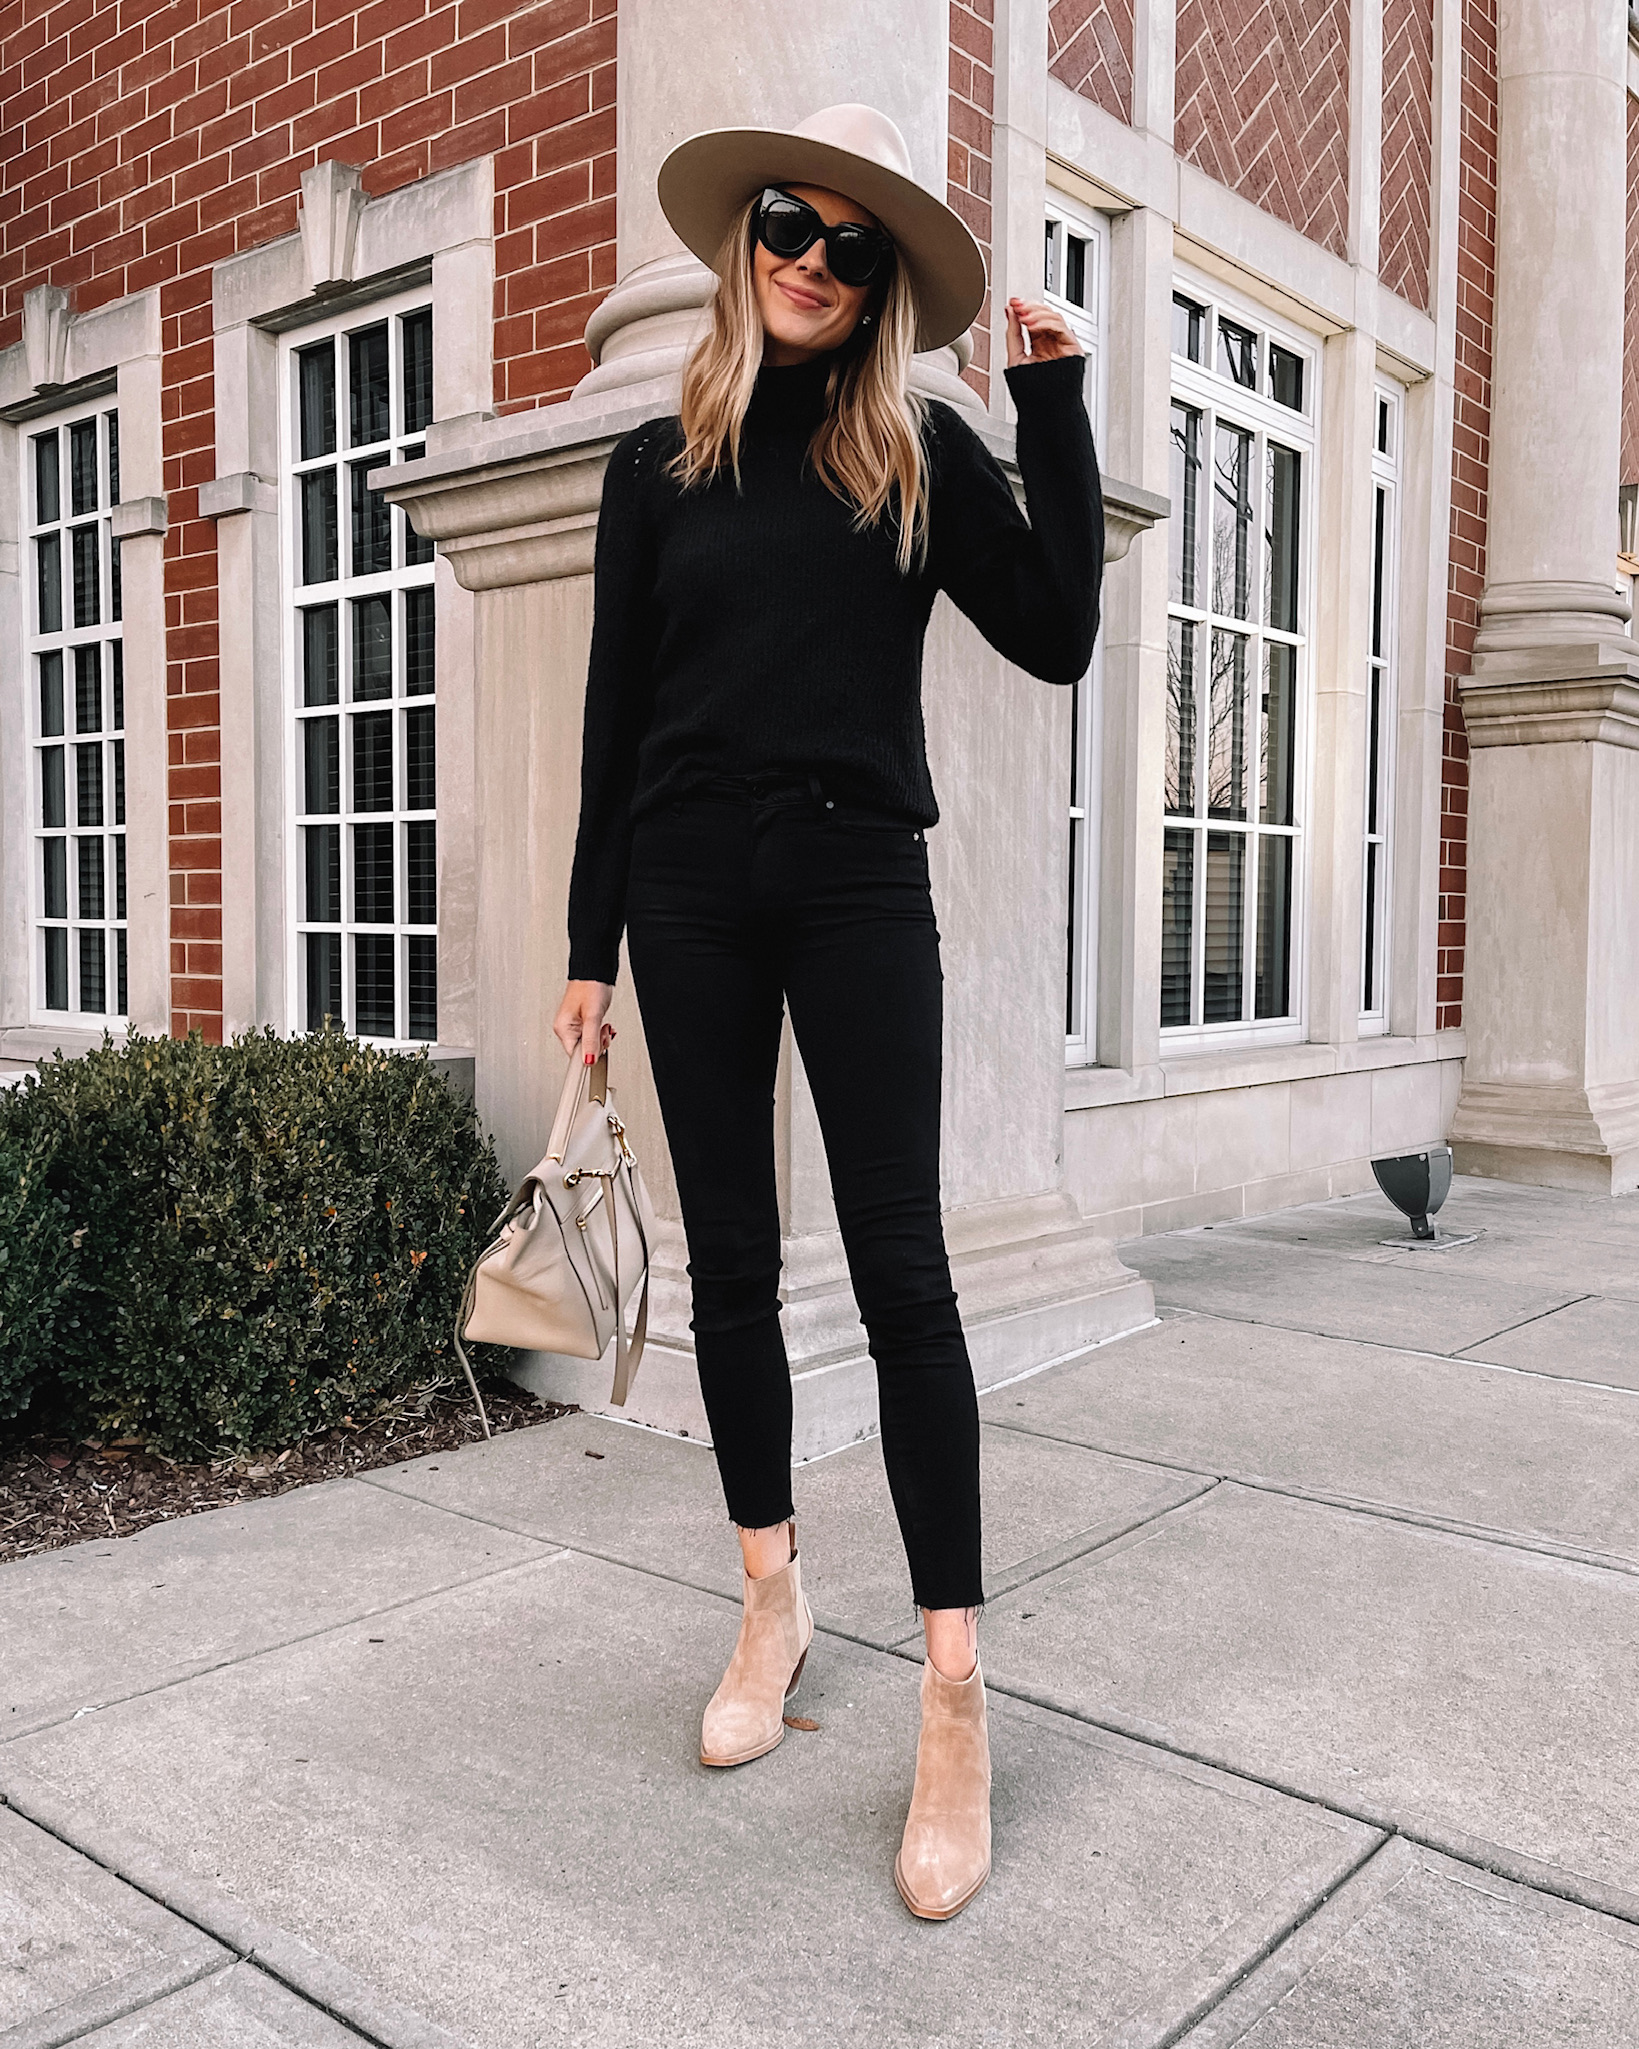 Fashion Jackson Wearing Black Sweater Black Skinny Jeans Beige Wide Brim Hat Tan Suede Booties